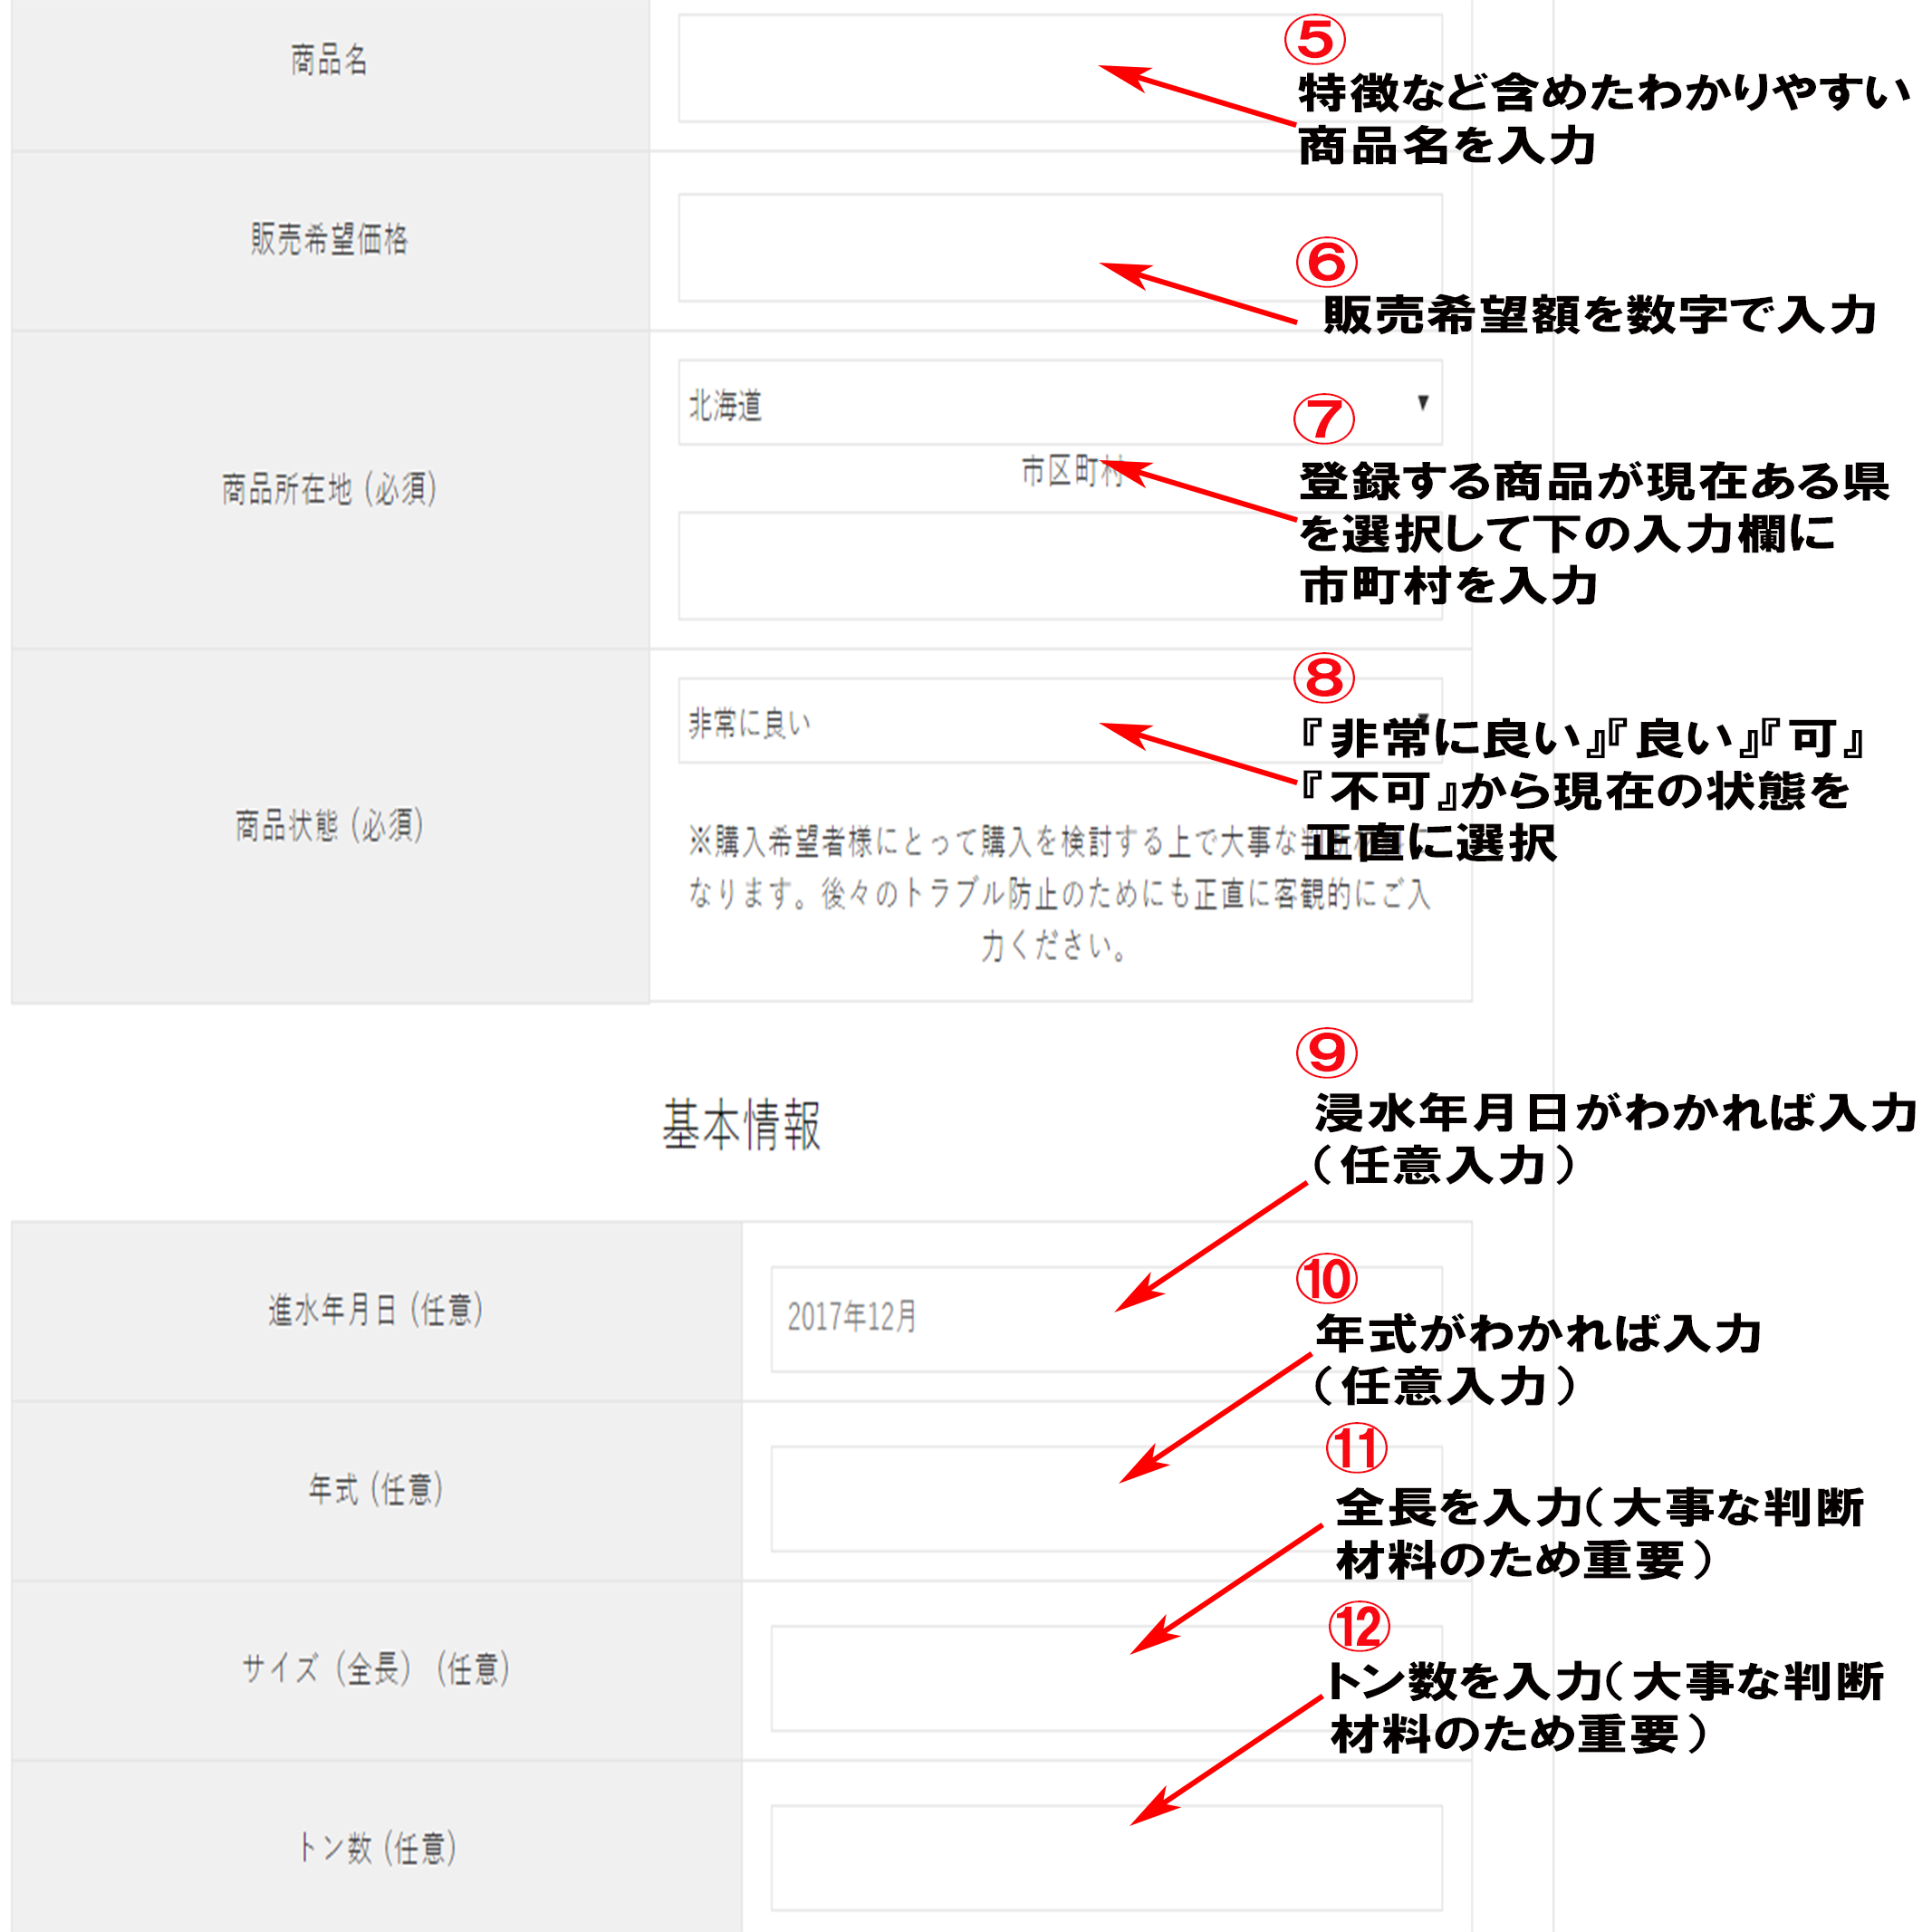 漁船の基本情報登録方法